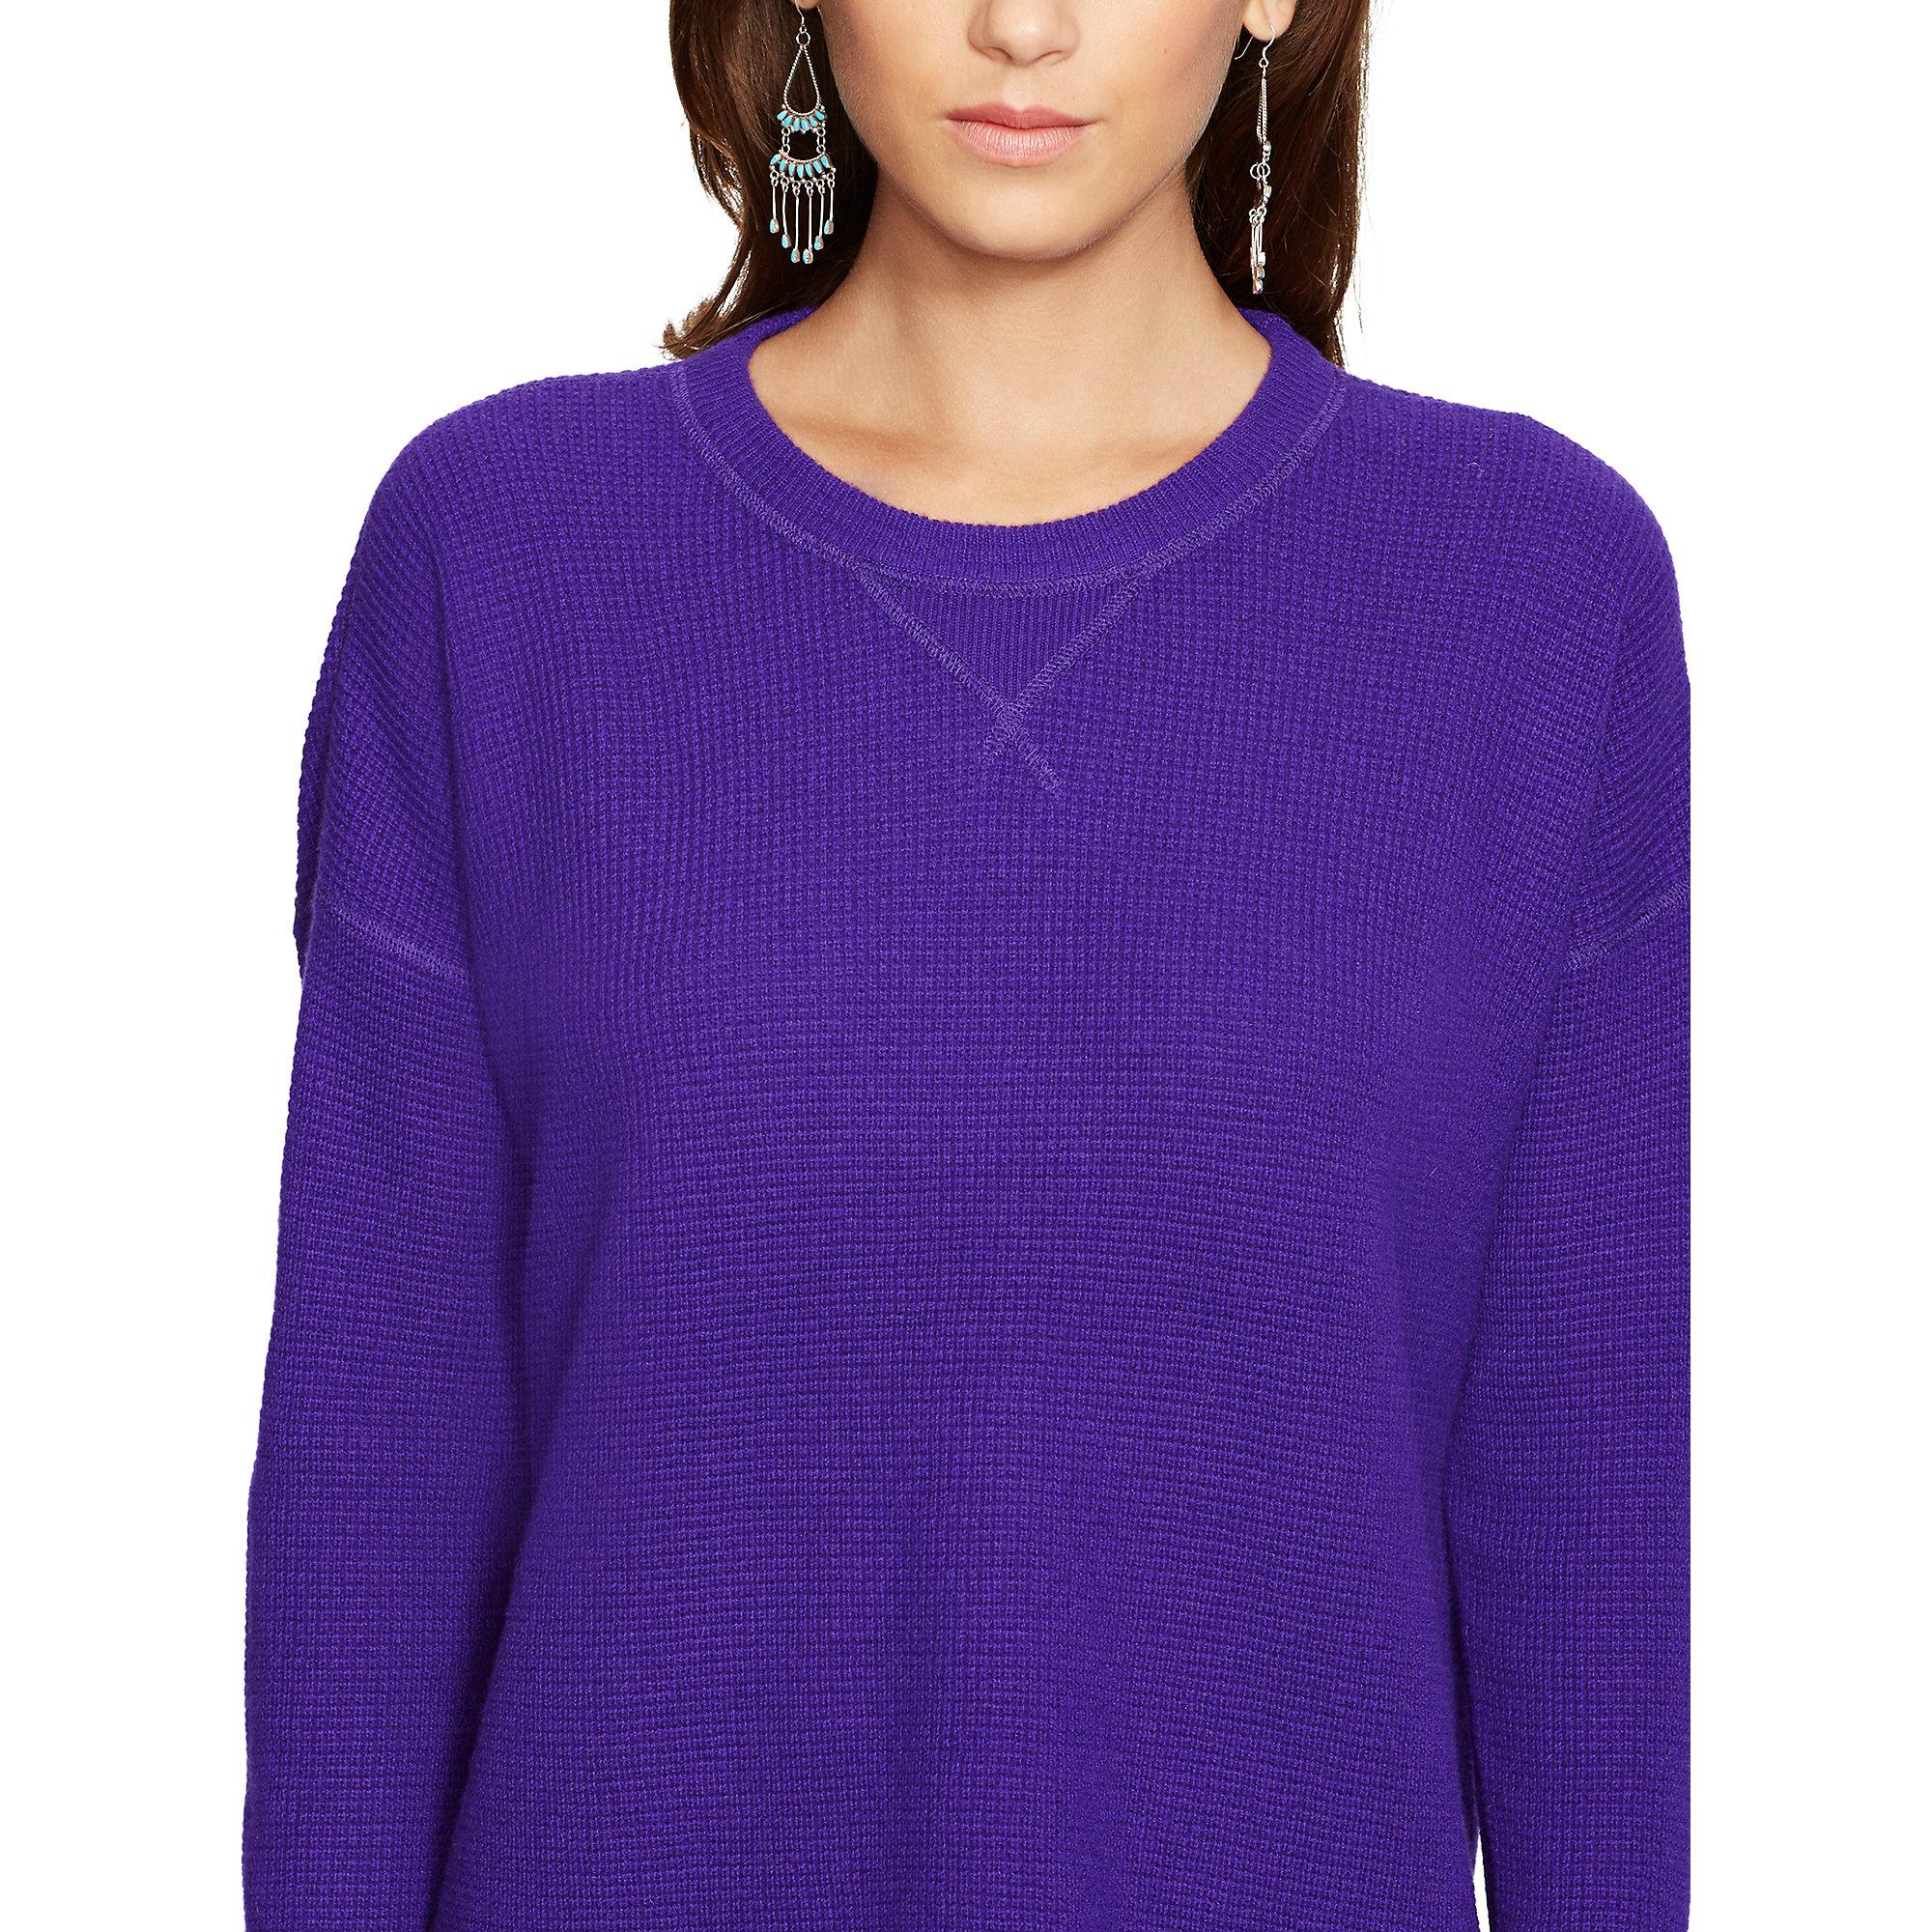 Polo ralph lauren Waffle-knit Cashmere Sweater in Purple | Lyst